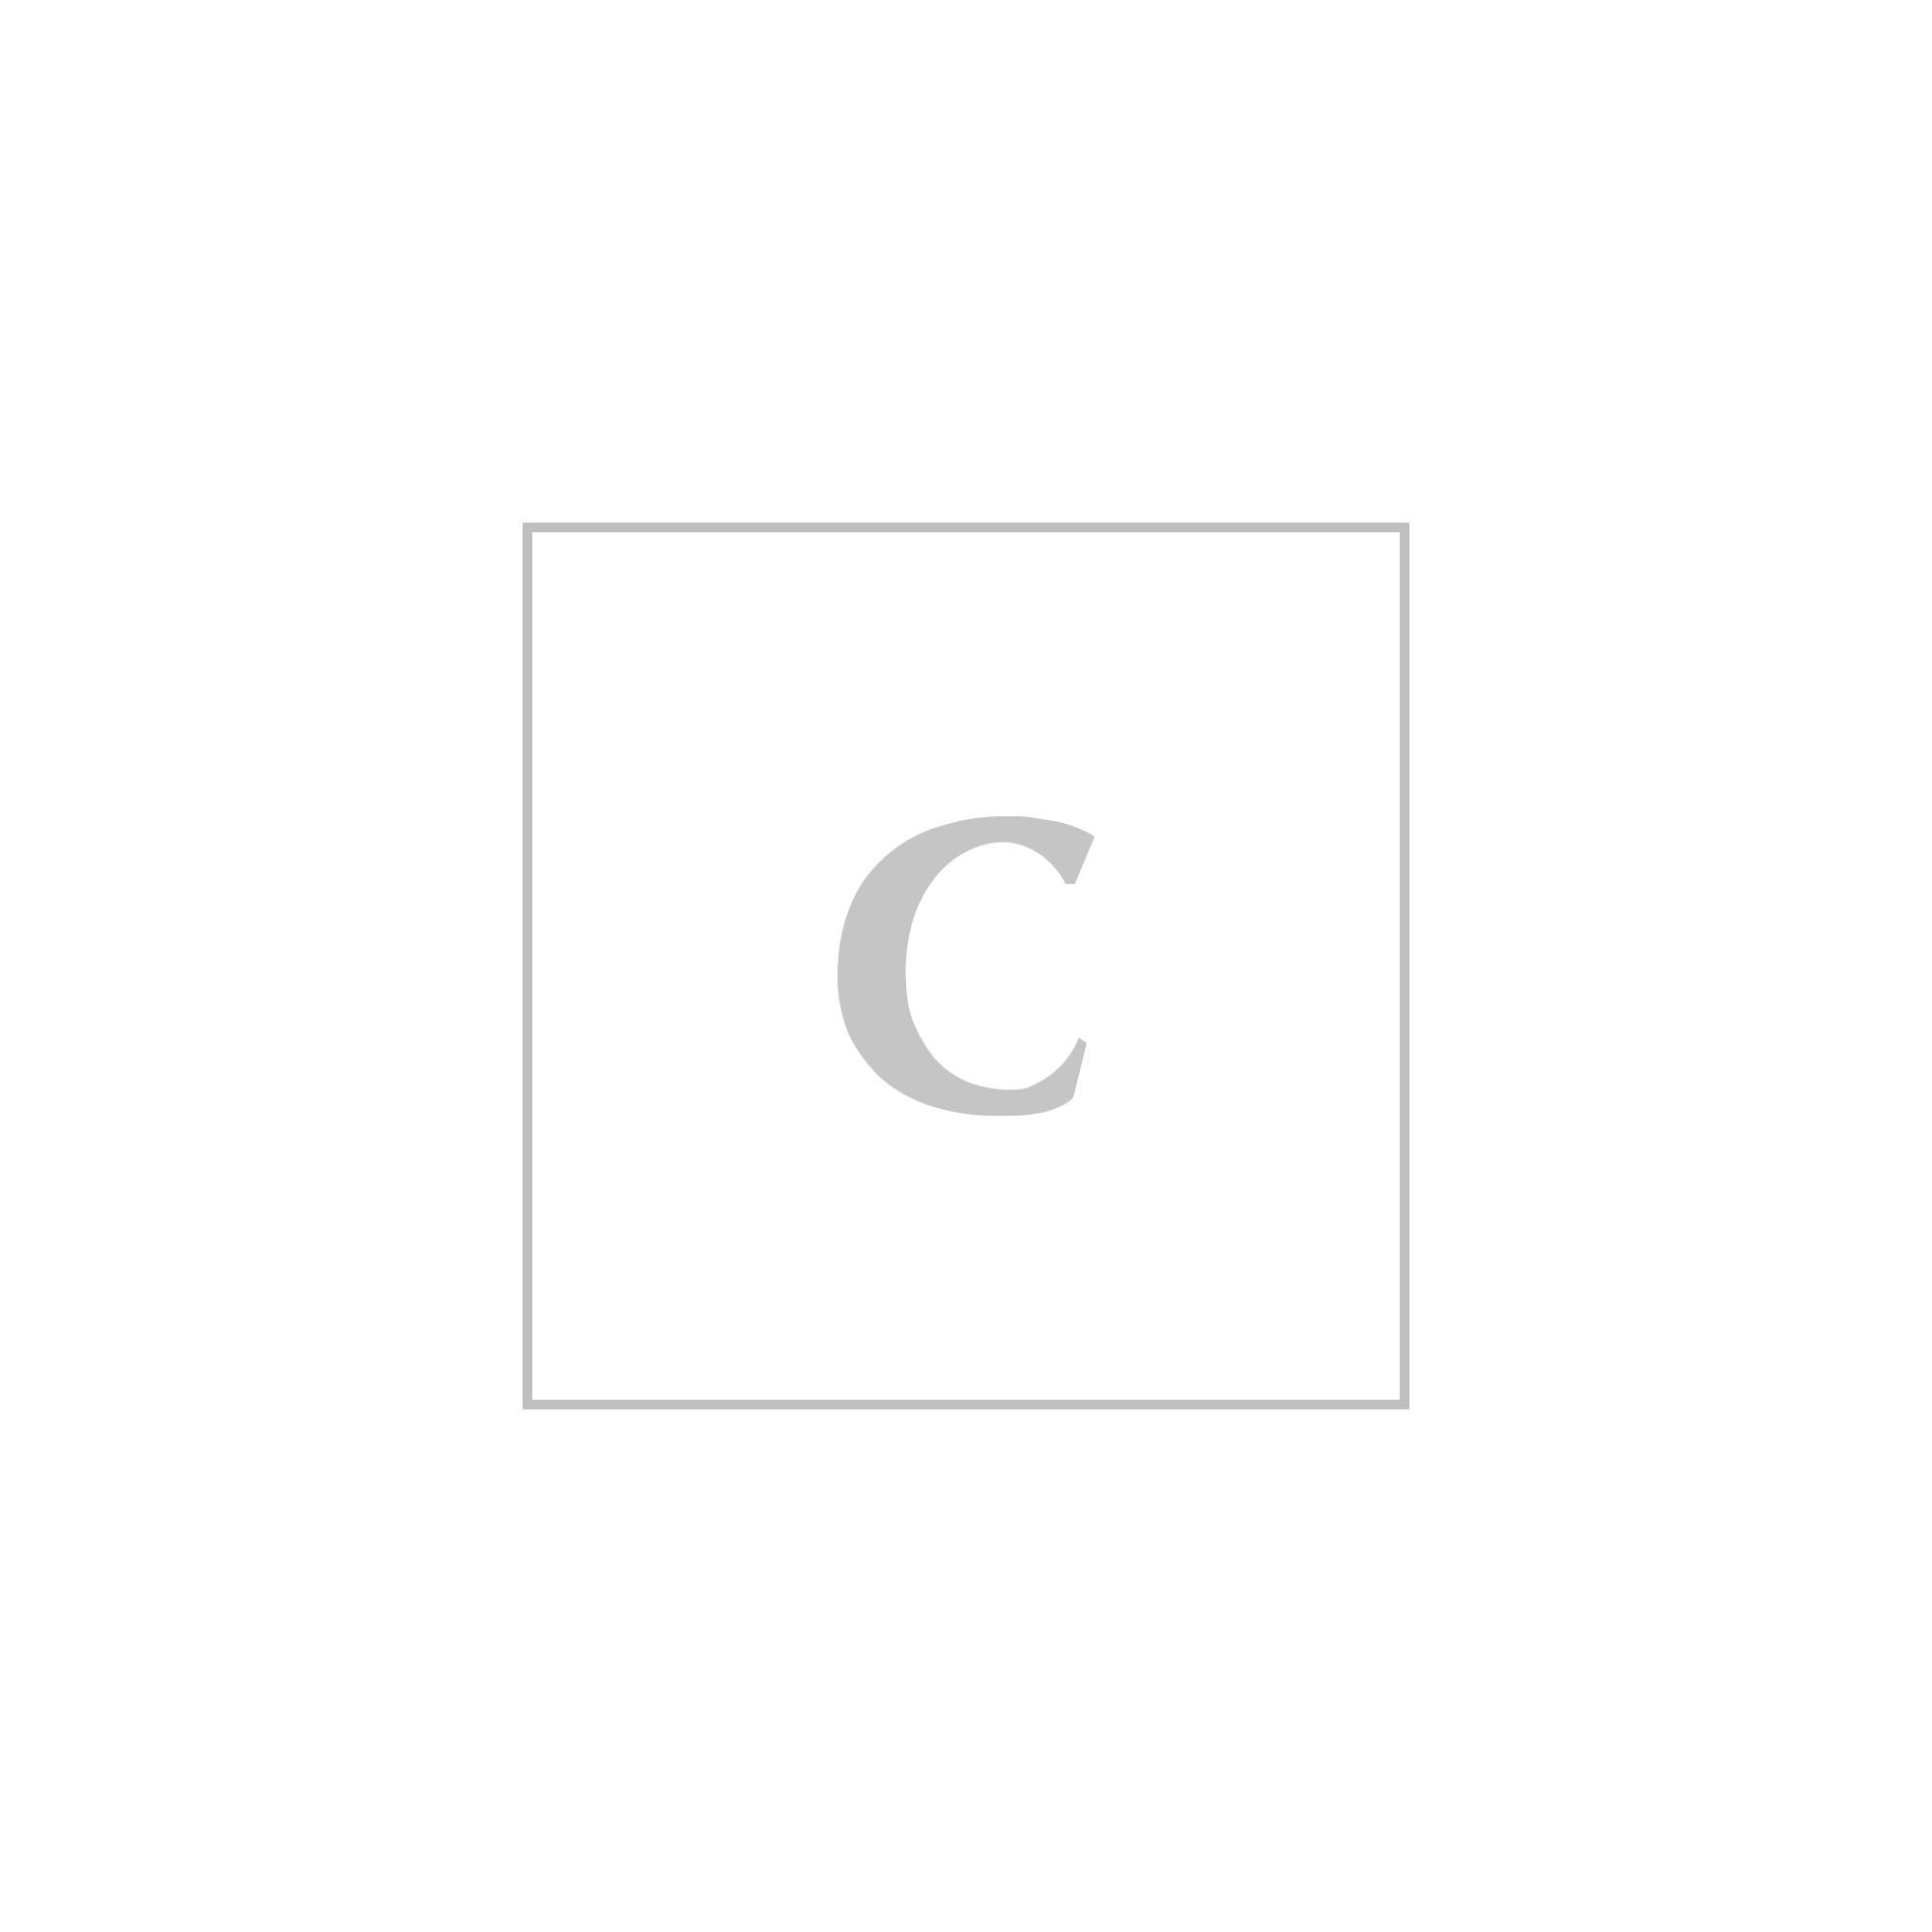 Moncler capsule giubbotto guillaume